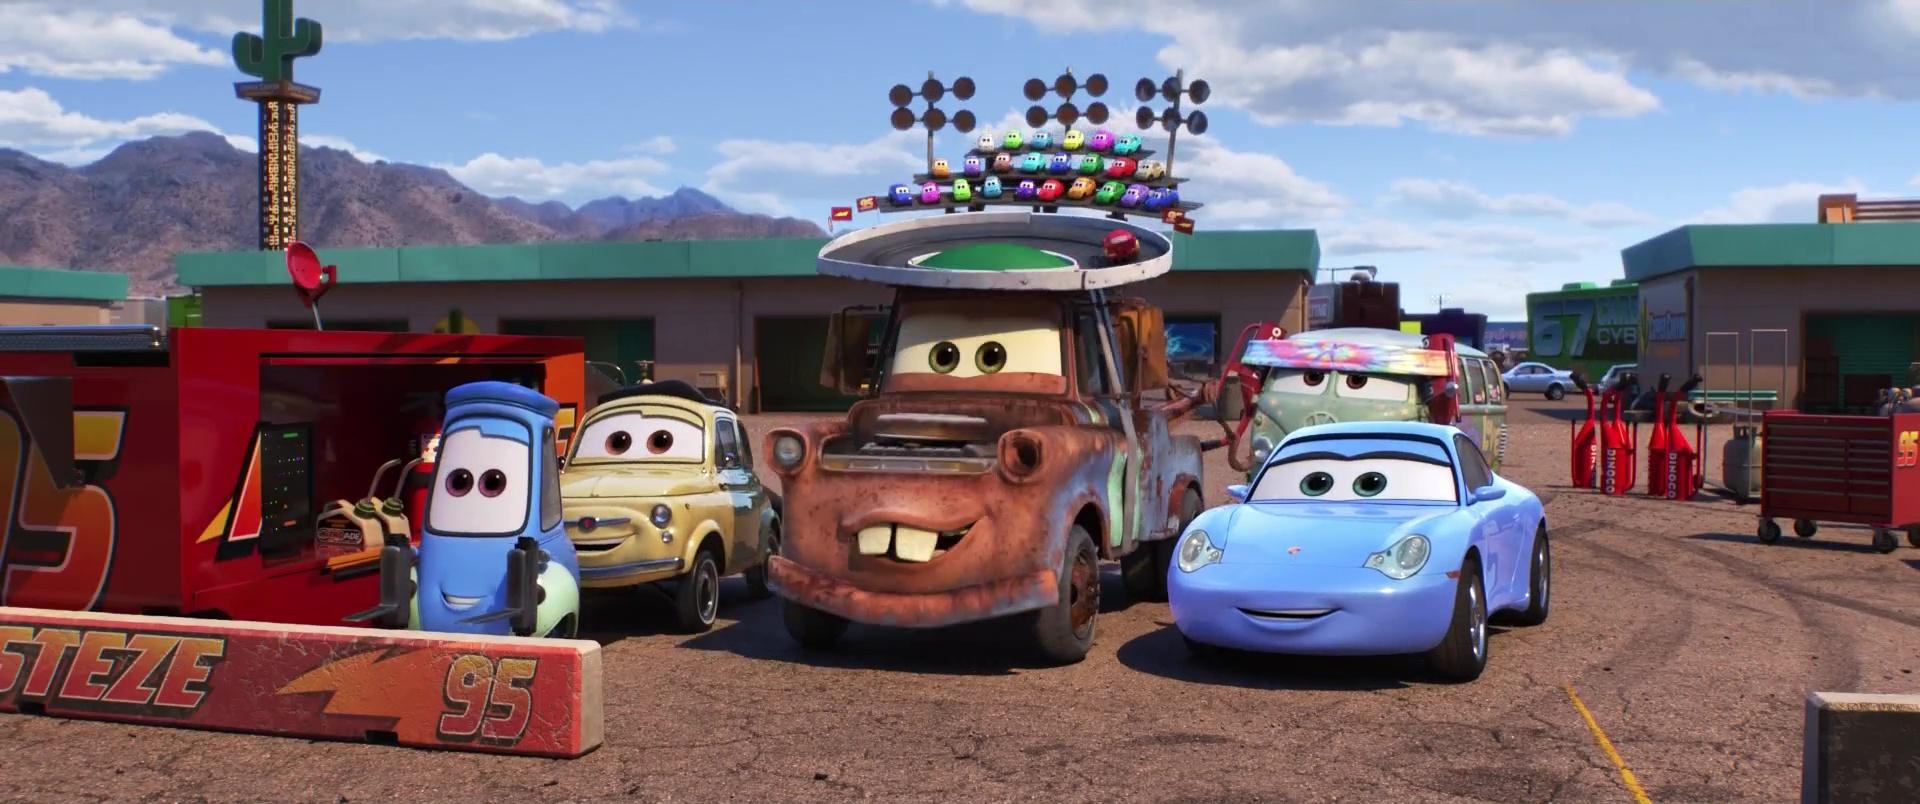 "Martin, Personnage Dans ""cars"". | Pixar-Planet.fr encequiconcerne Flash Mcqueen Martin"